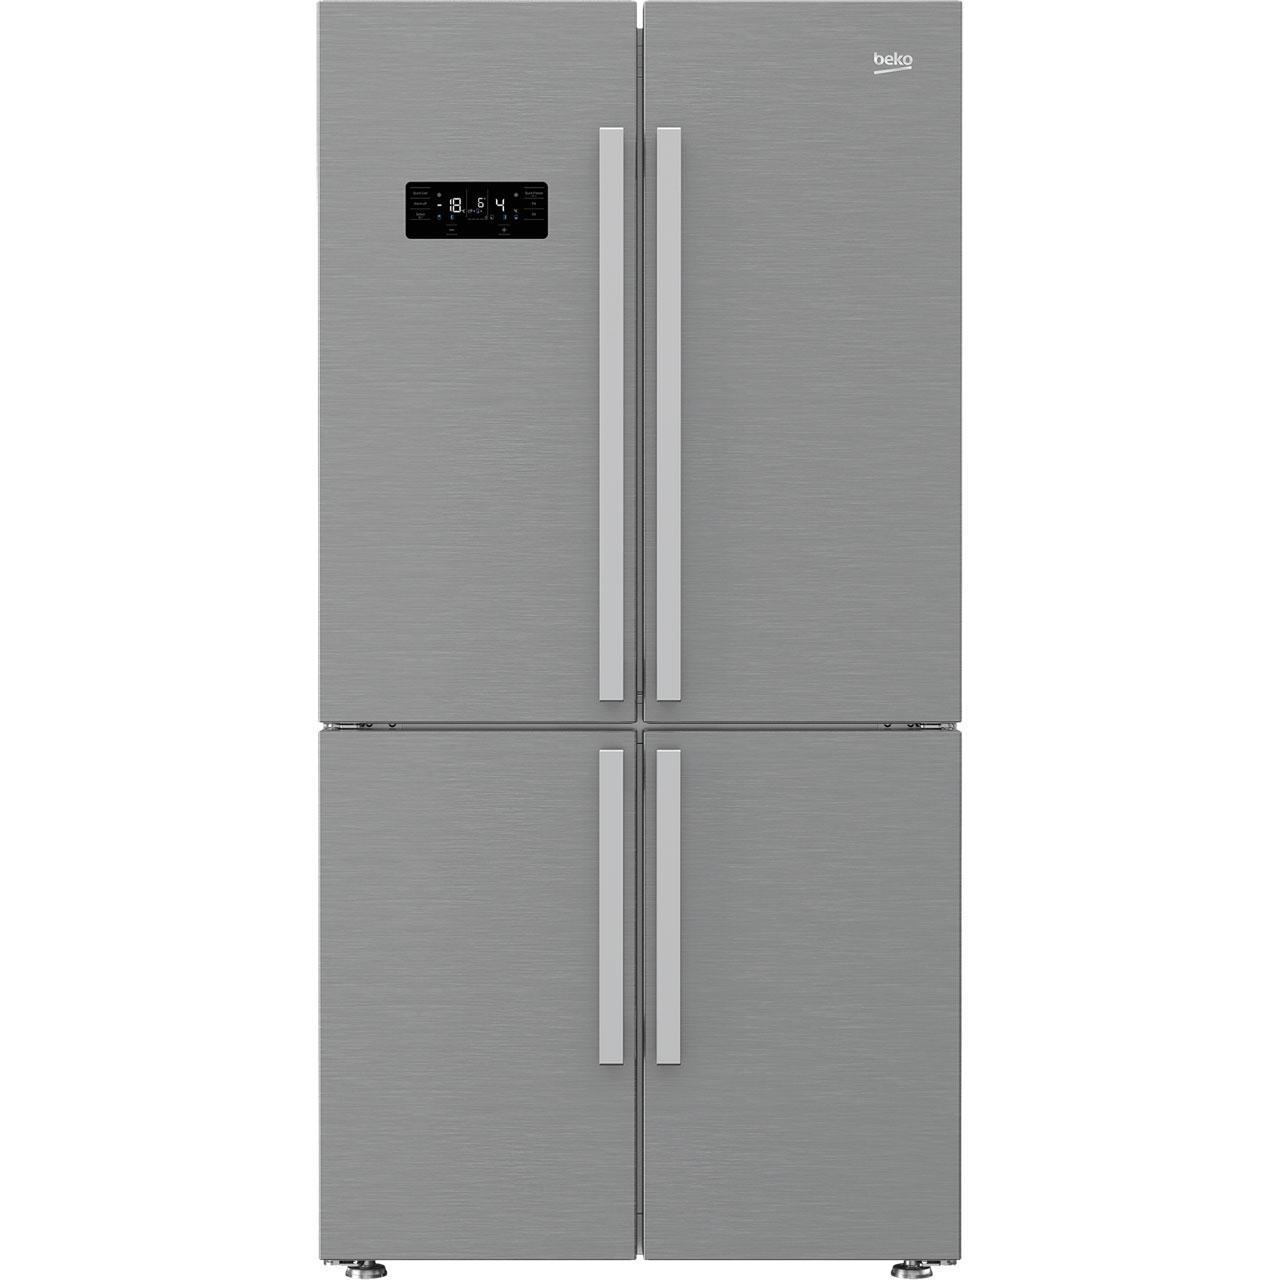 Beko GN1416221ZX Free Standing American Fridge Freezer in Stainless Steel